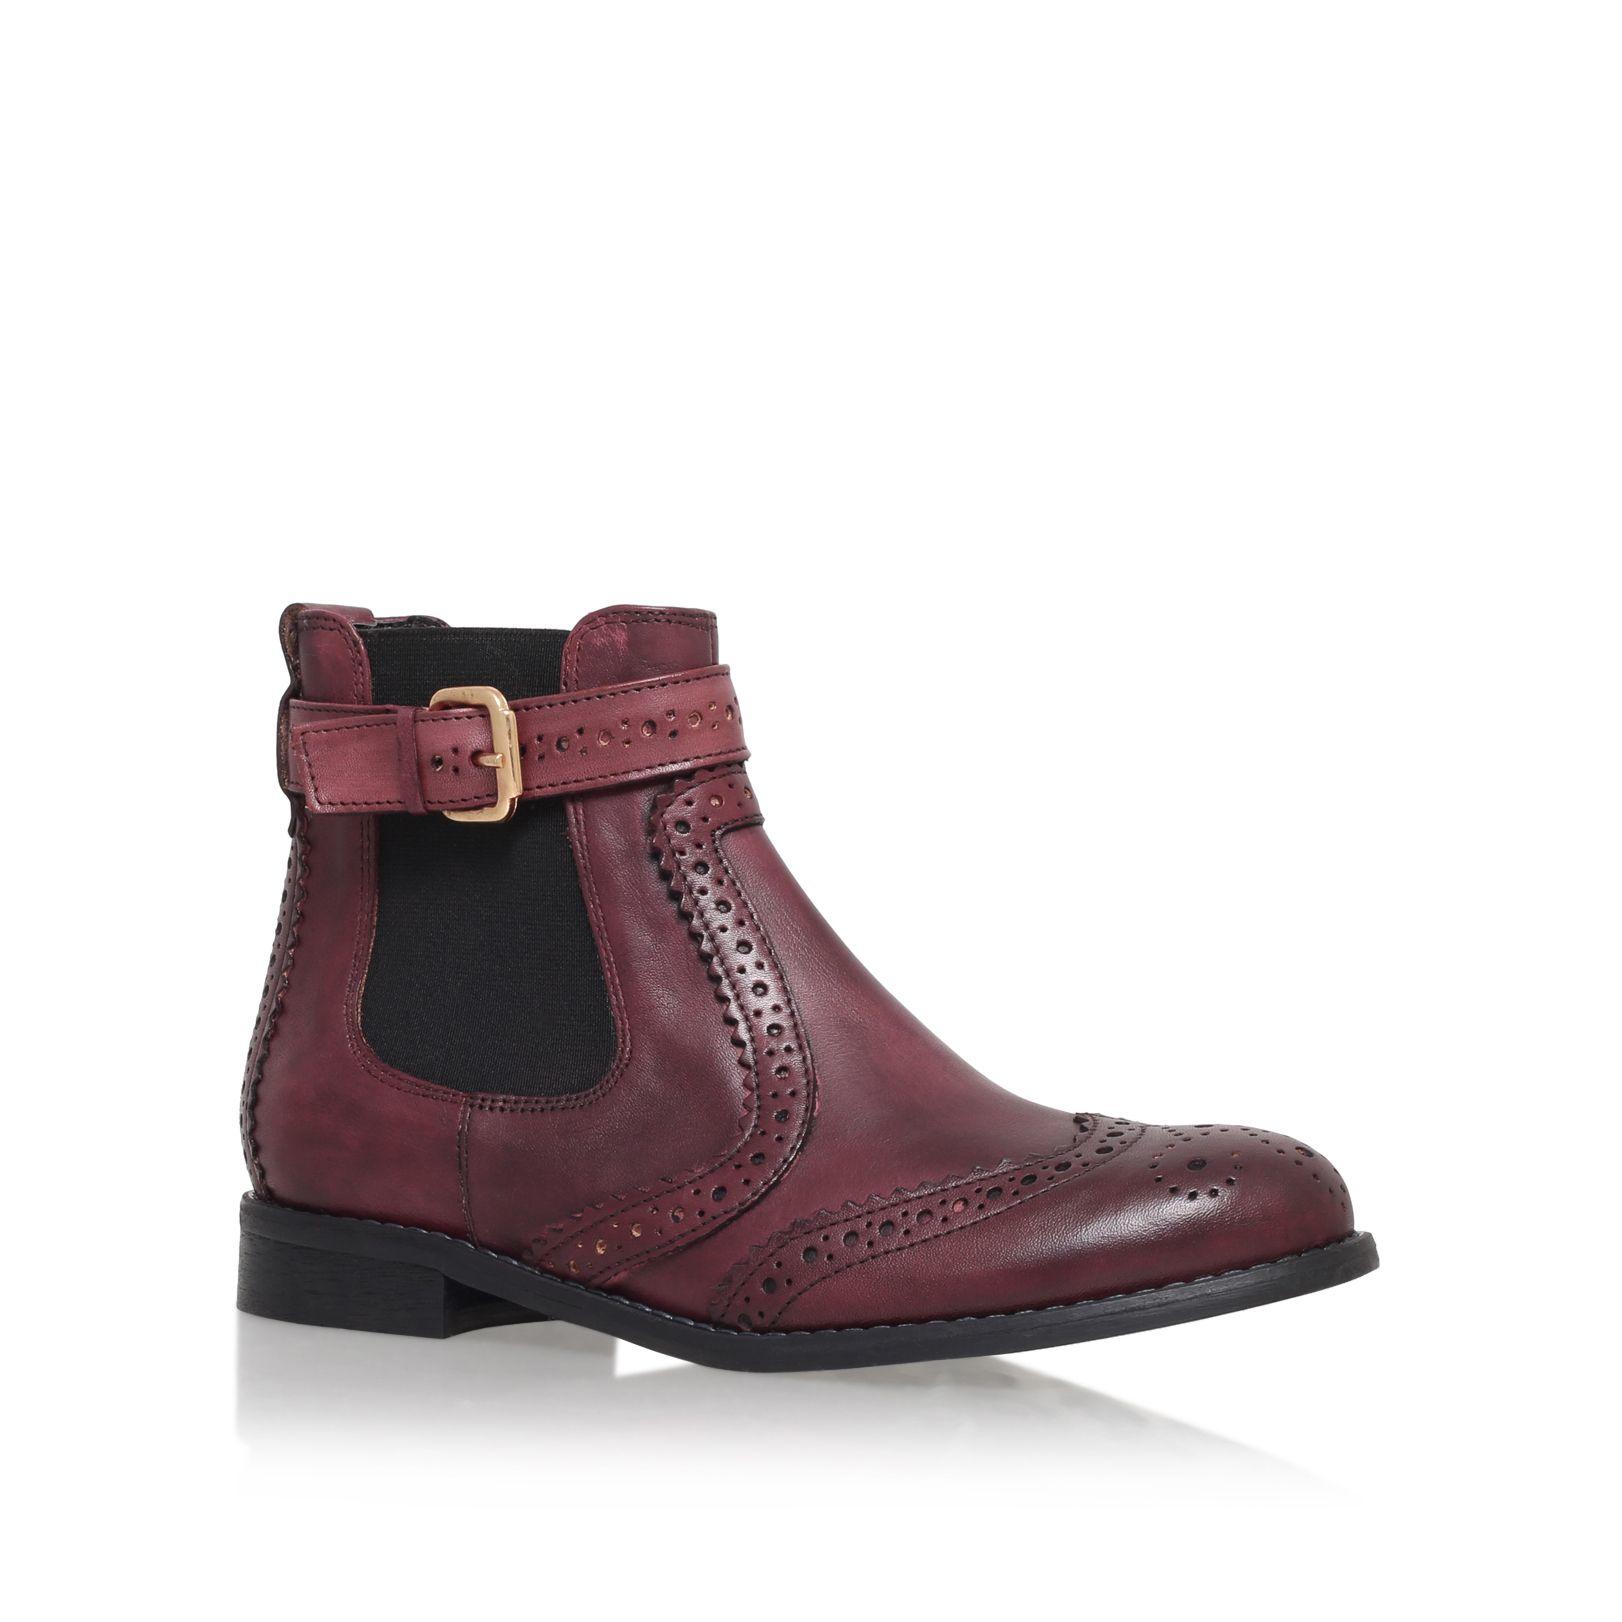 Carvela Kurt Geiger Slow Chelsea Boots In Purple For Men   Lyst